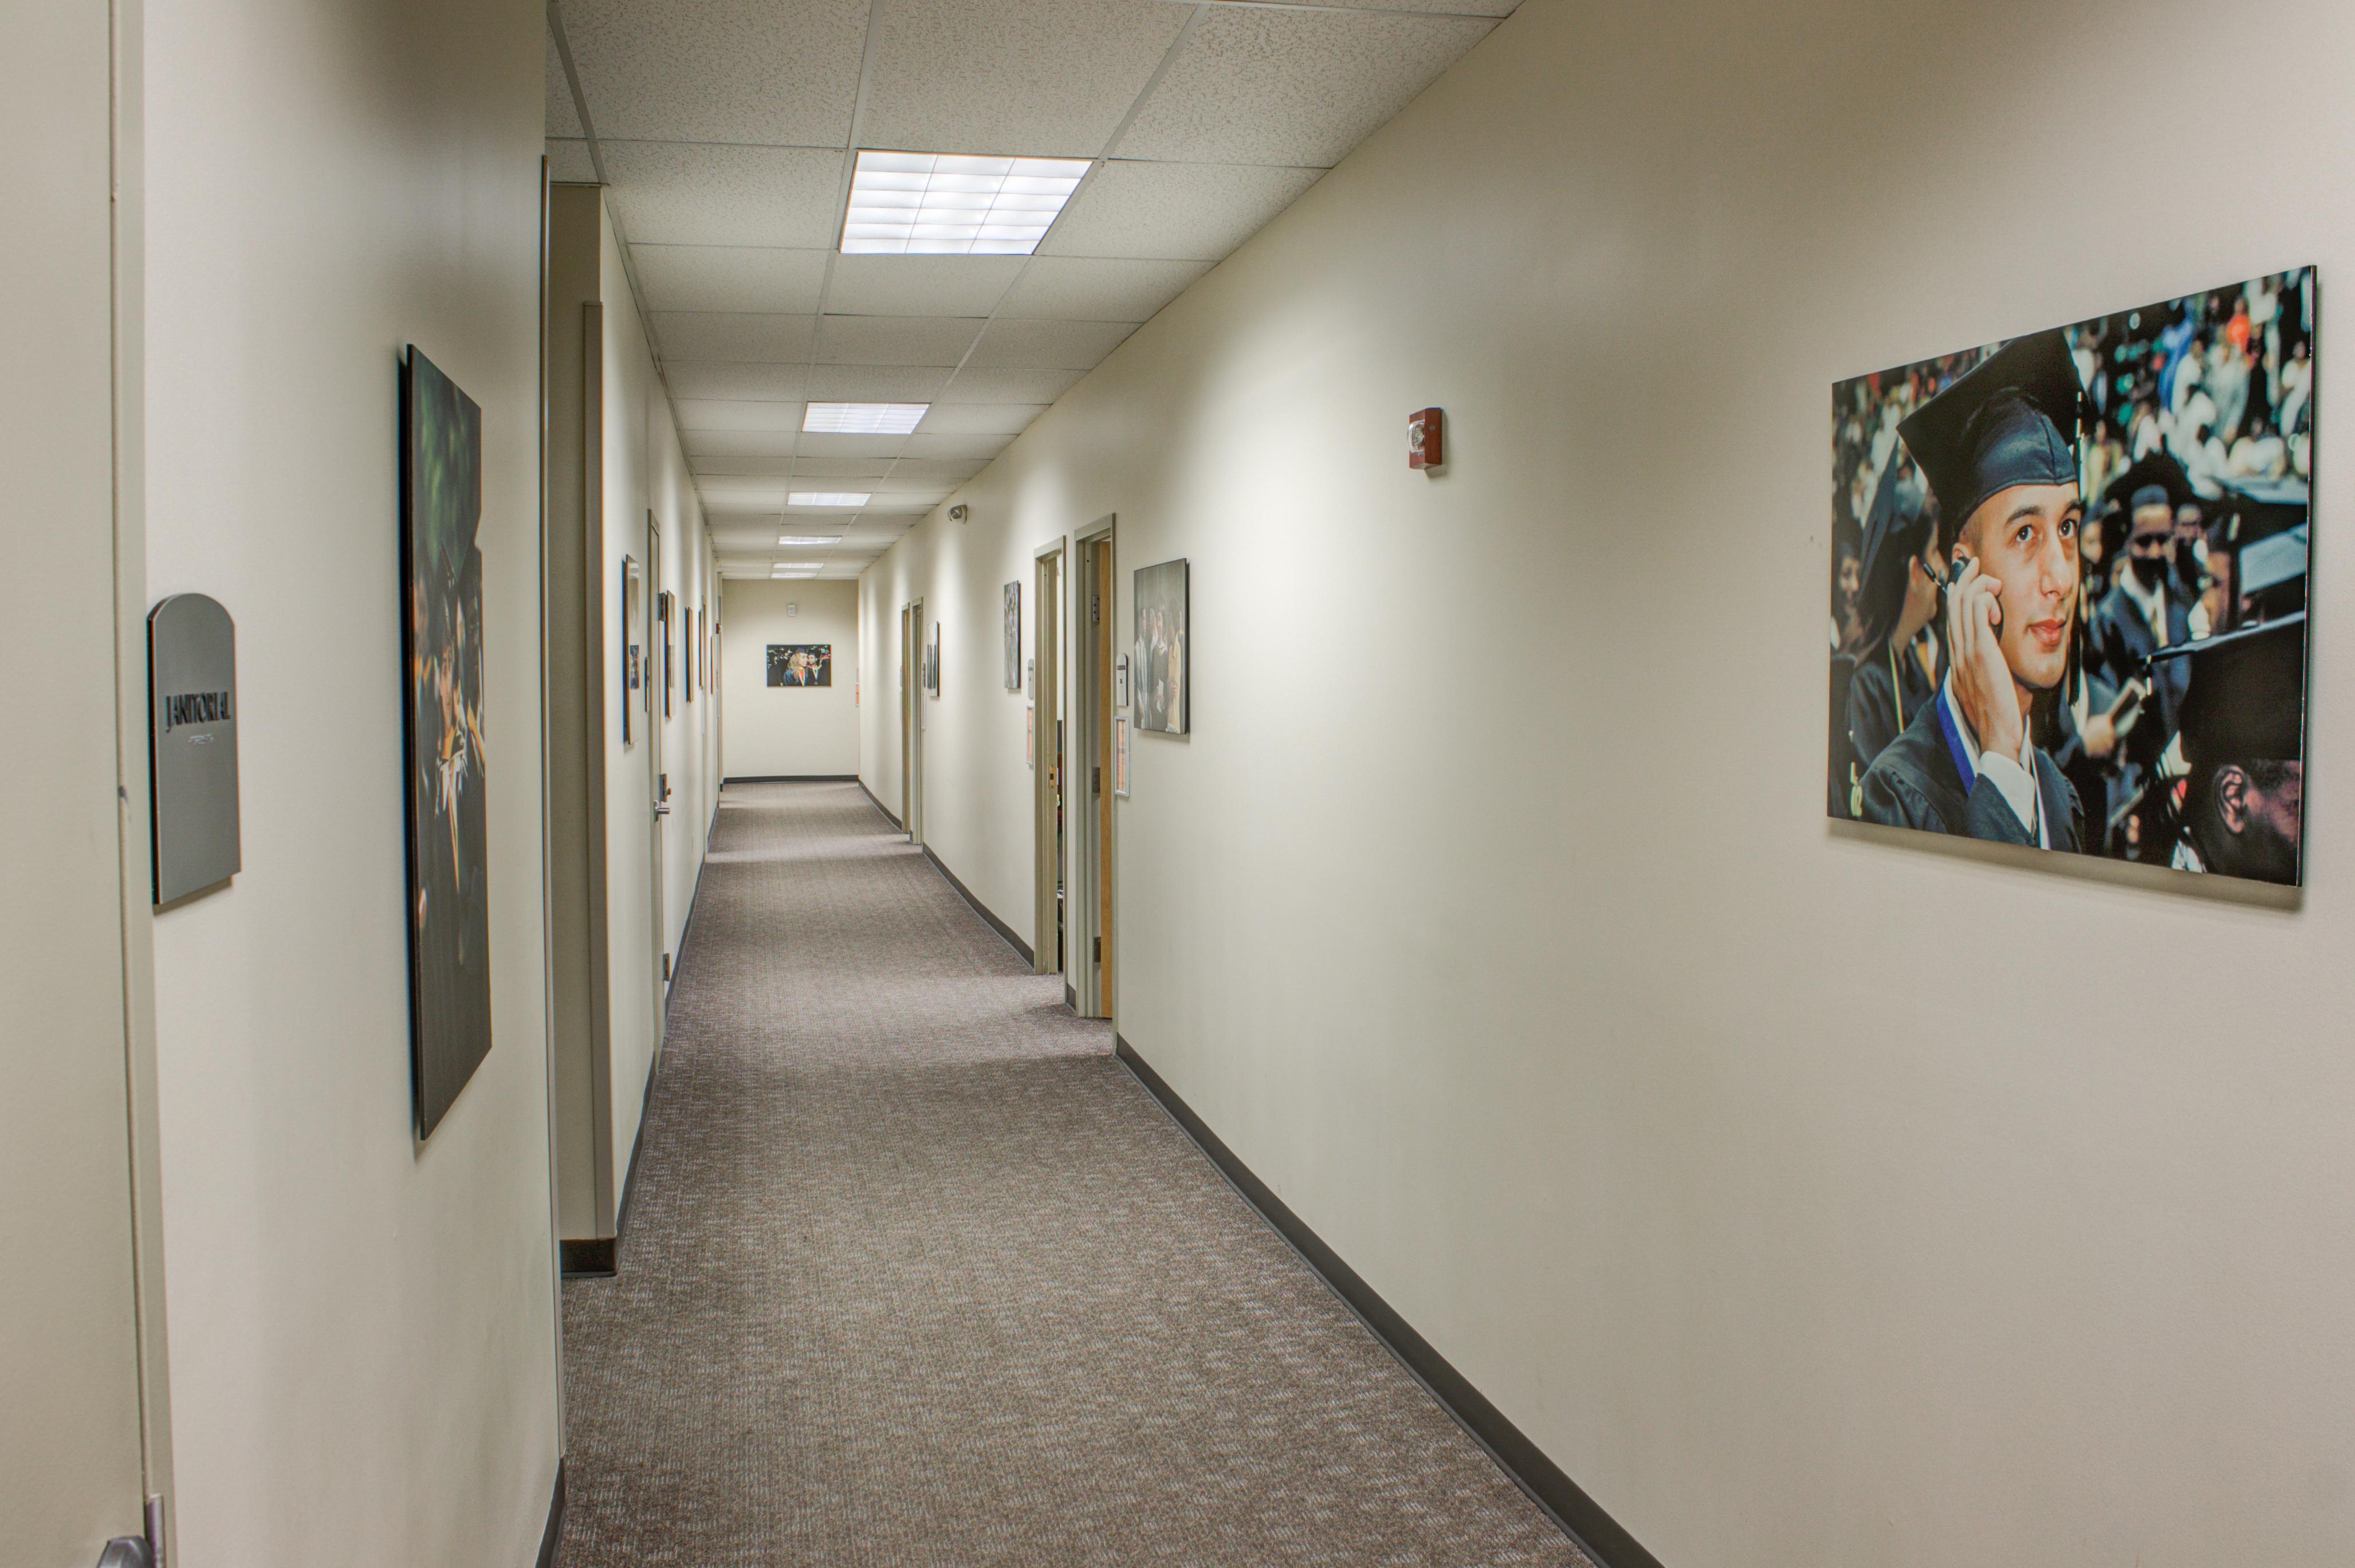 Strayer University image 3